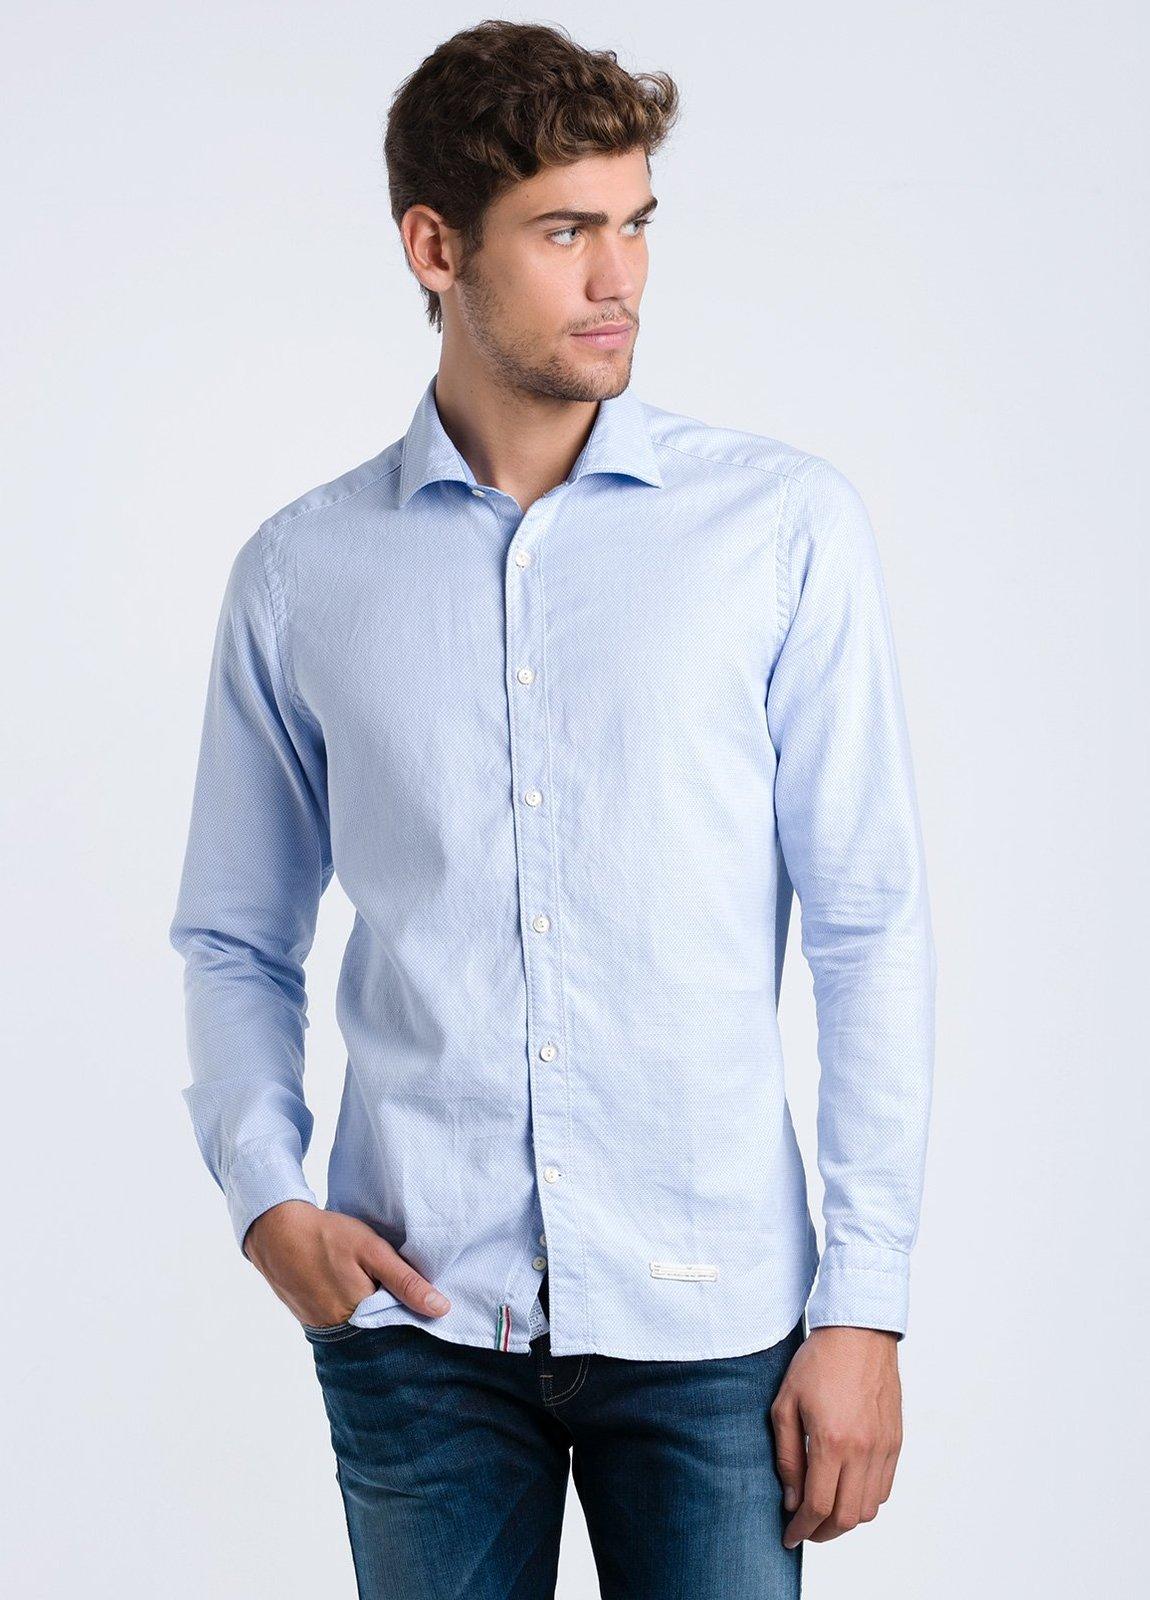 Camisa sport lisa SLIM FIT color celeste con textura, 100% Algodón.